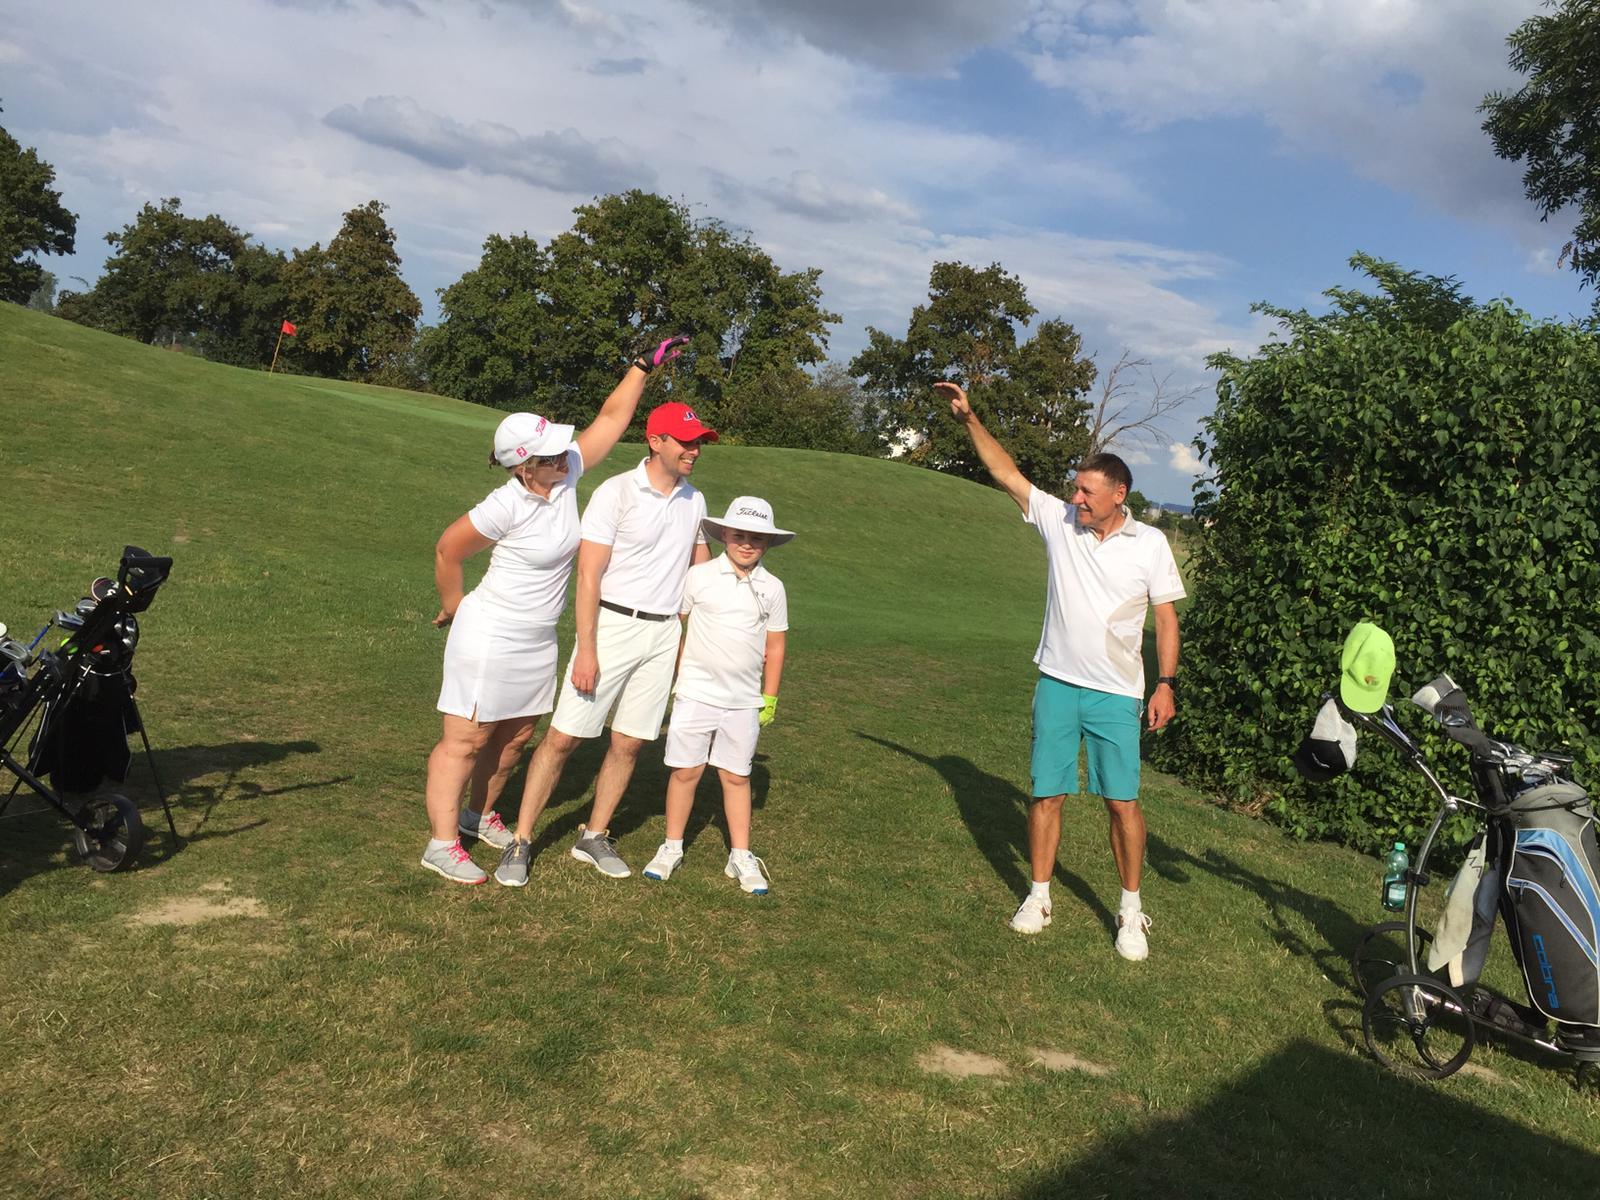 28_Golfturnier_Soroptimist_Golf_en_blanc